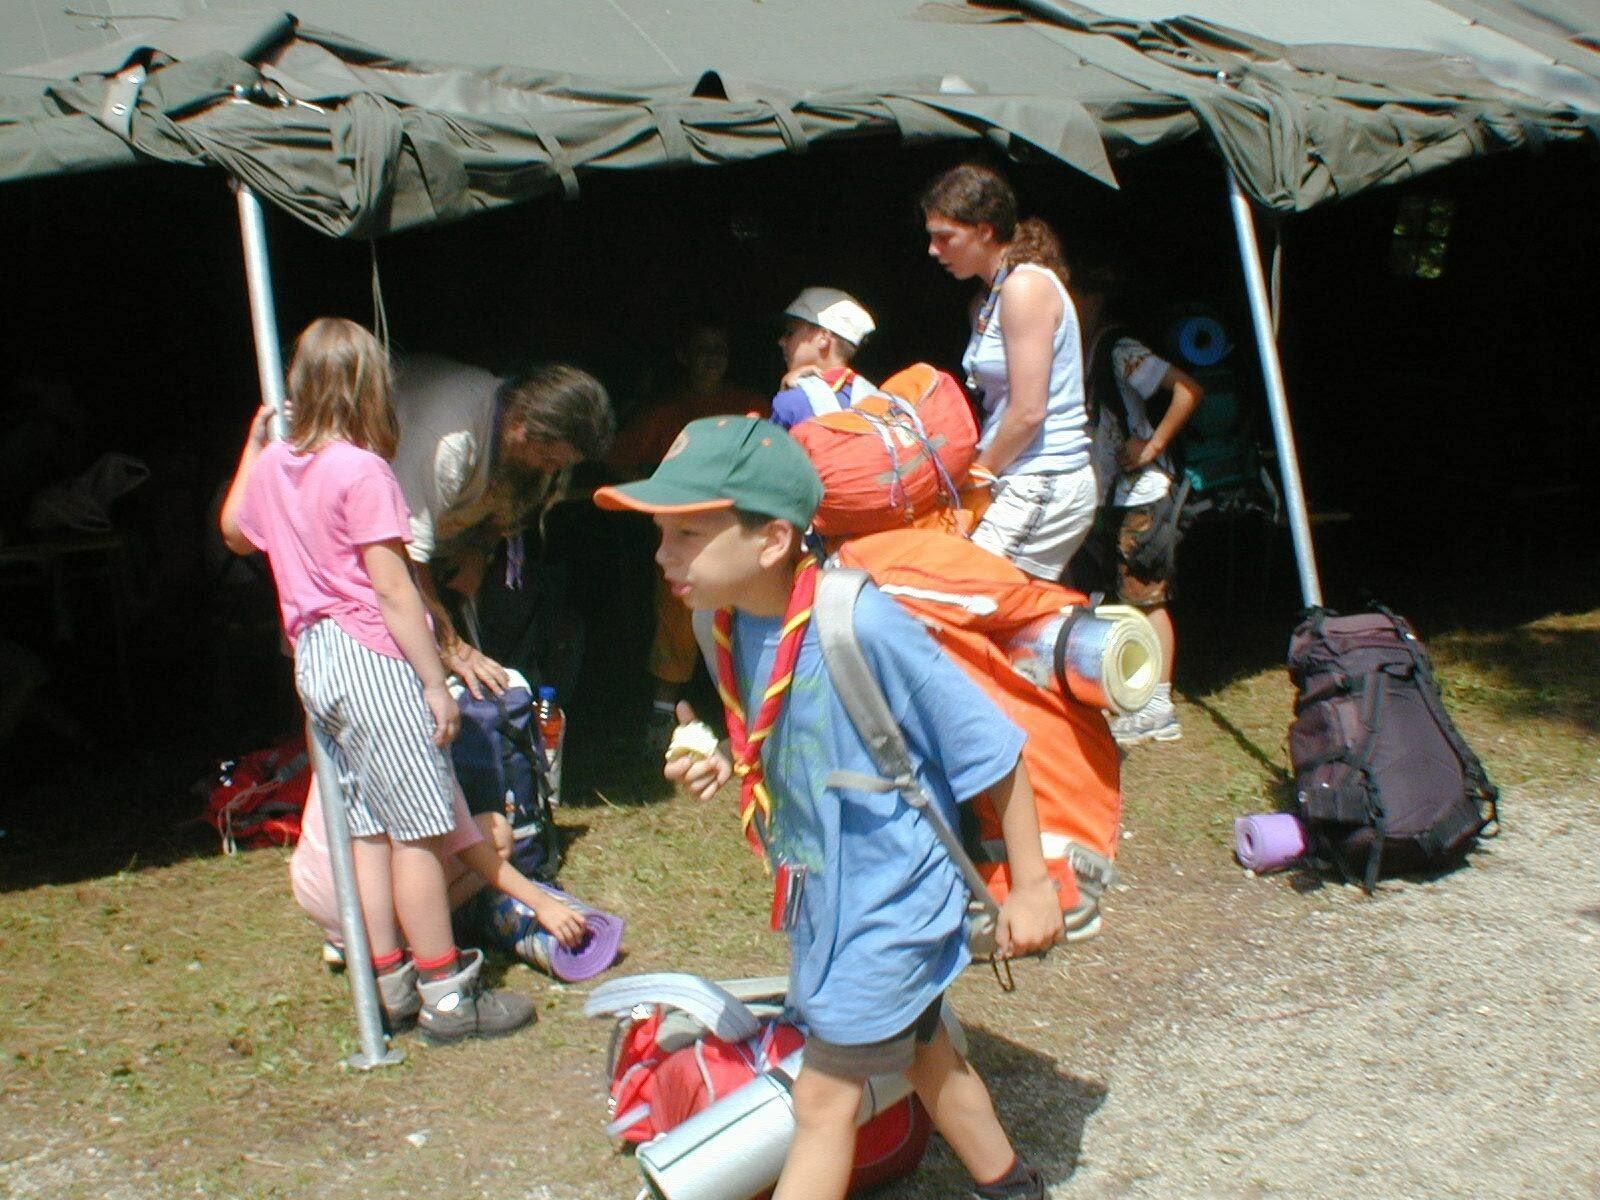 Taborjenje, Bohinj 2001 - 7.jpg